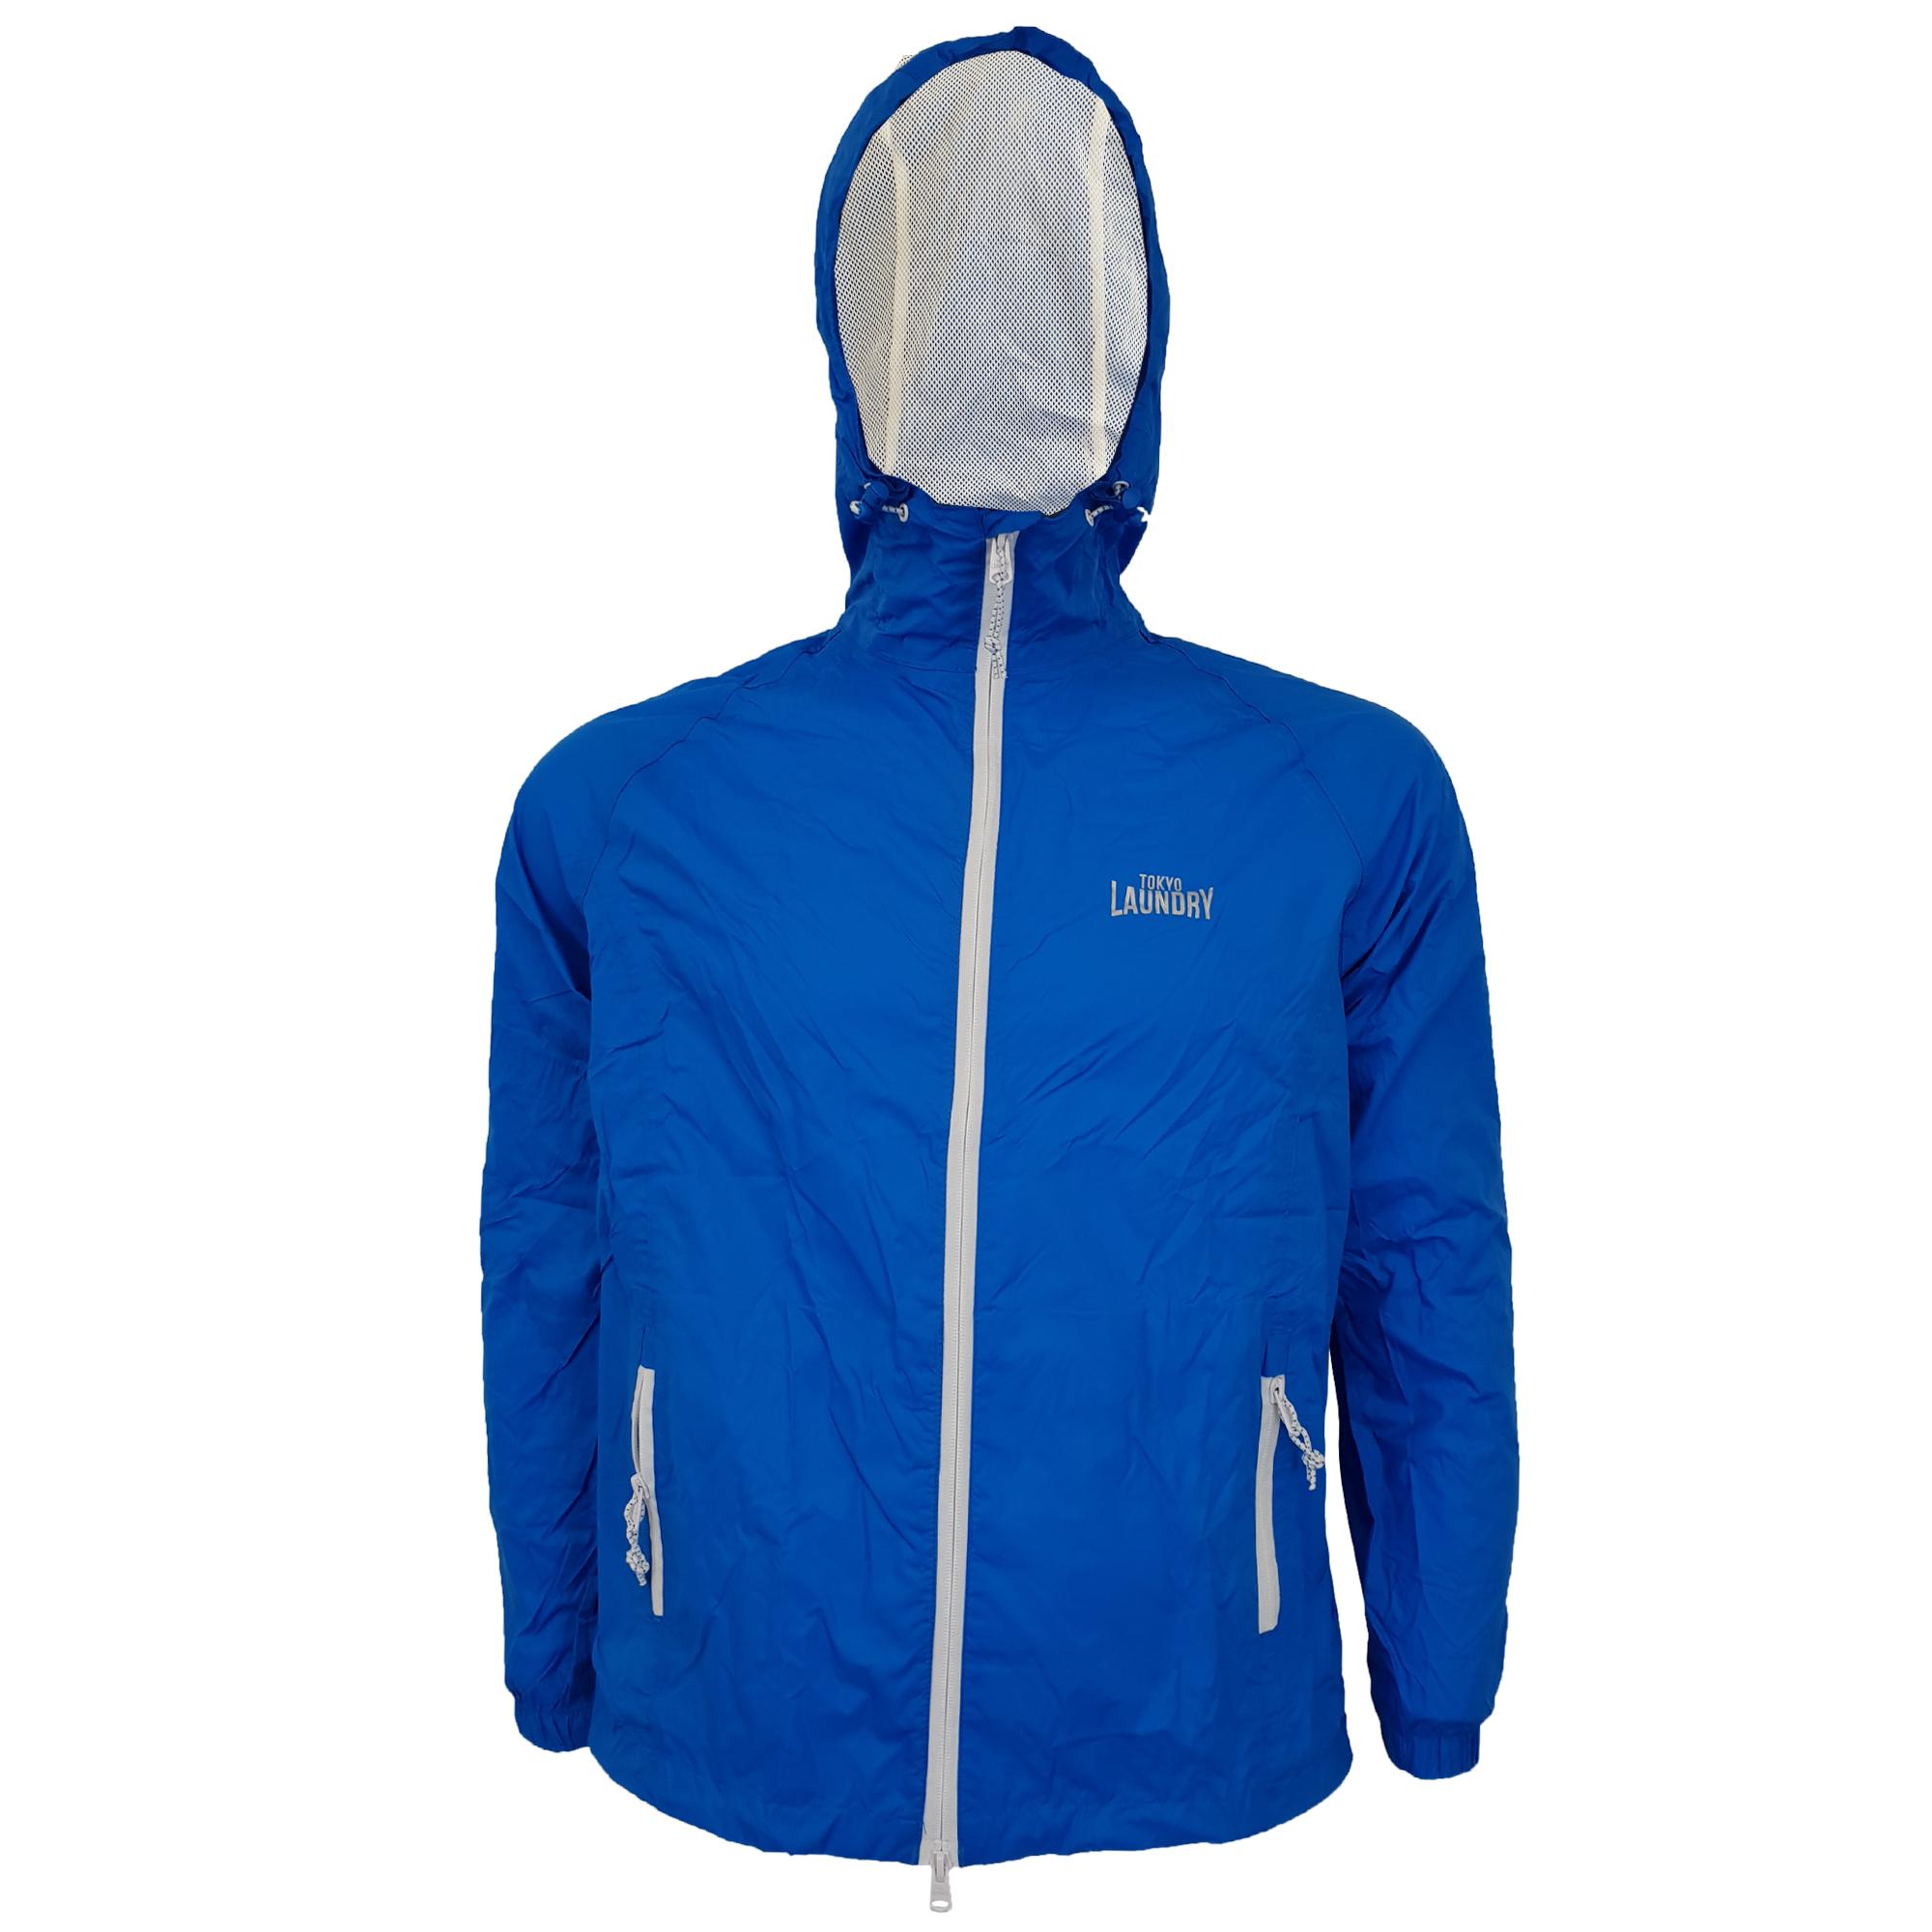 Mens-Kagool-Breathable-Hooded-Jacket-Tokyo-Laundry-Waterproof-Coat-Windproof-New thumbnail 6